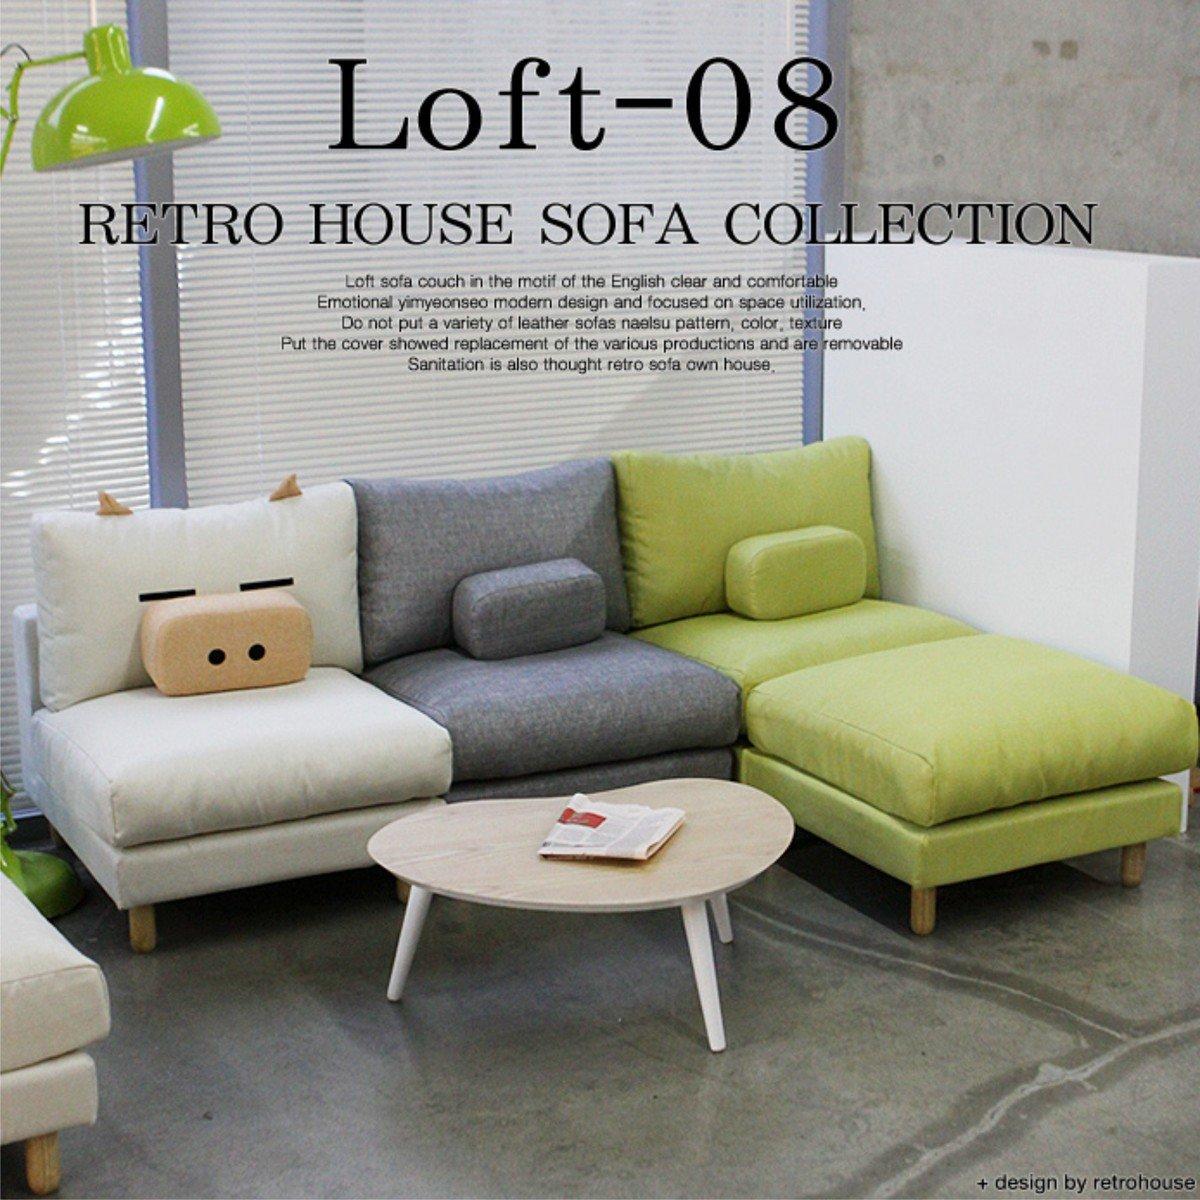 Loft-08 梳化